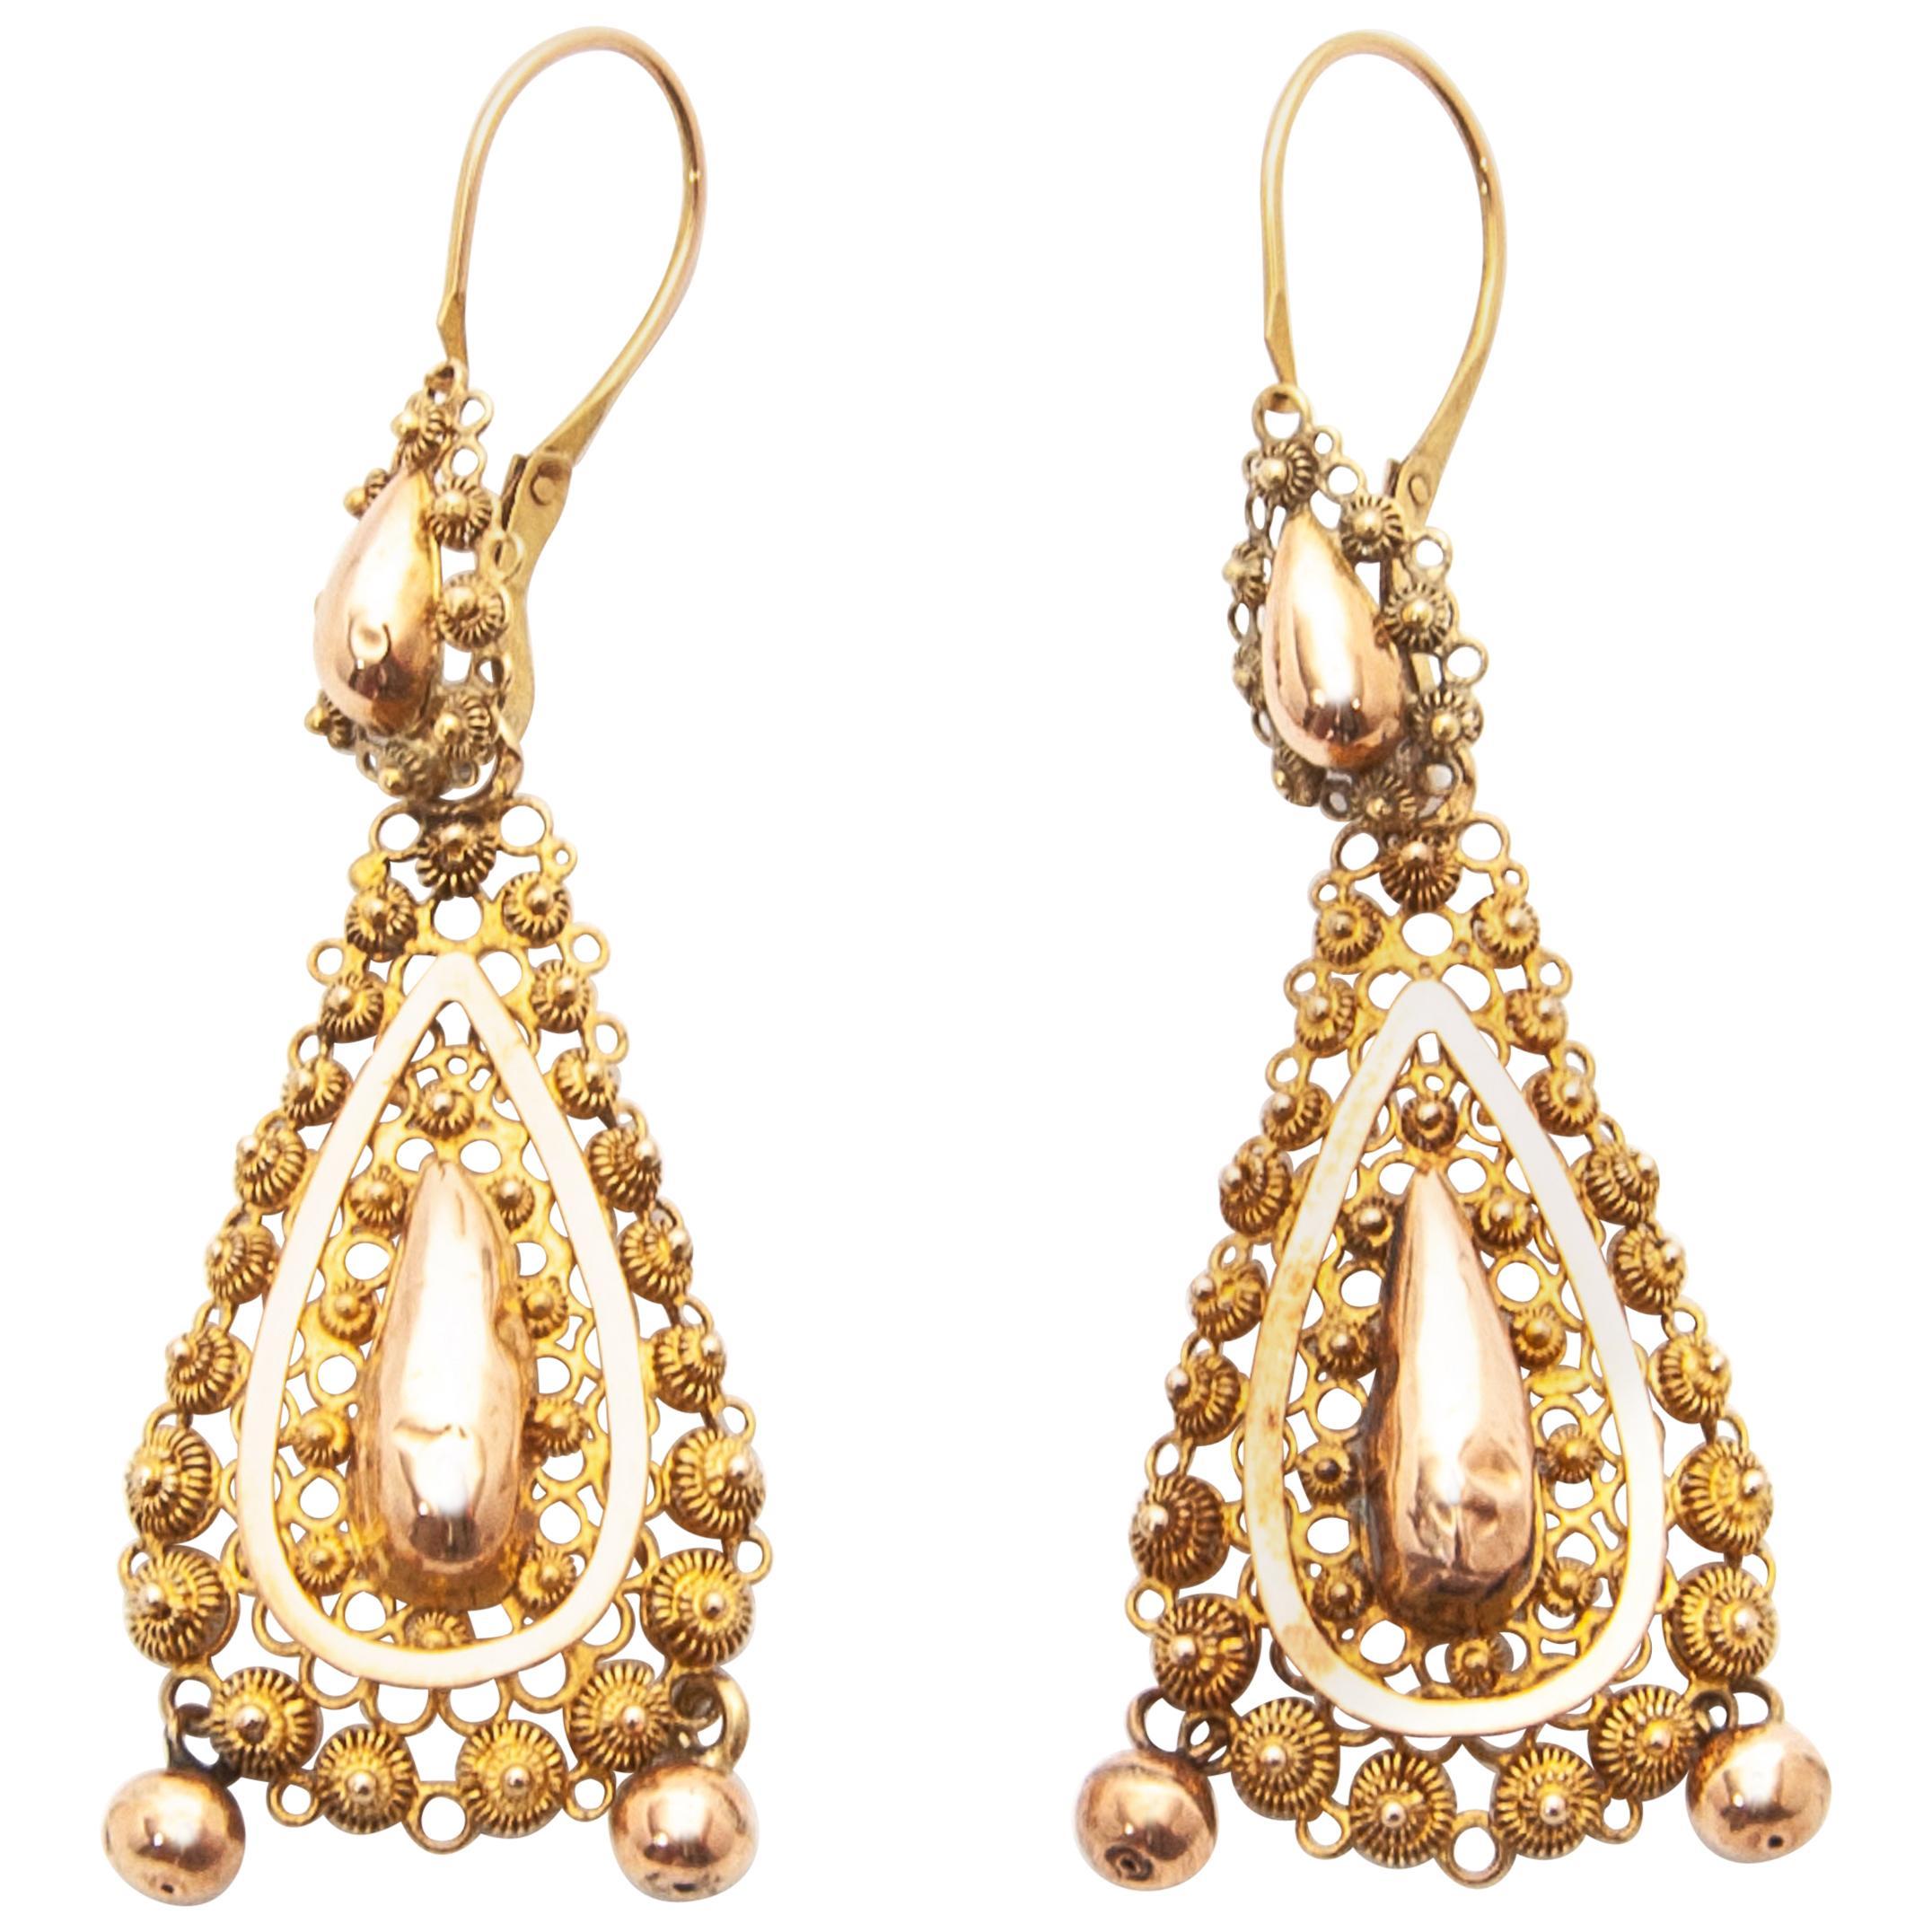 14 Karat Yellow Gold Pear-Shape Filigree Drop Earrings